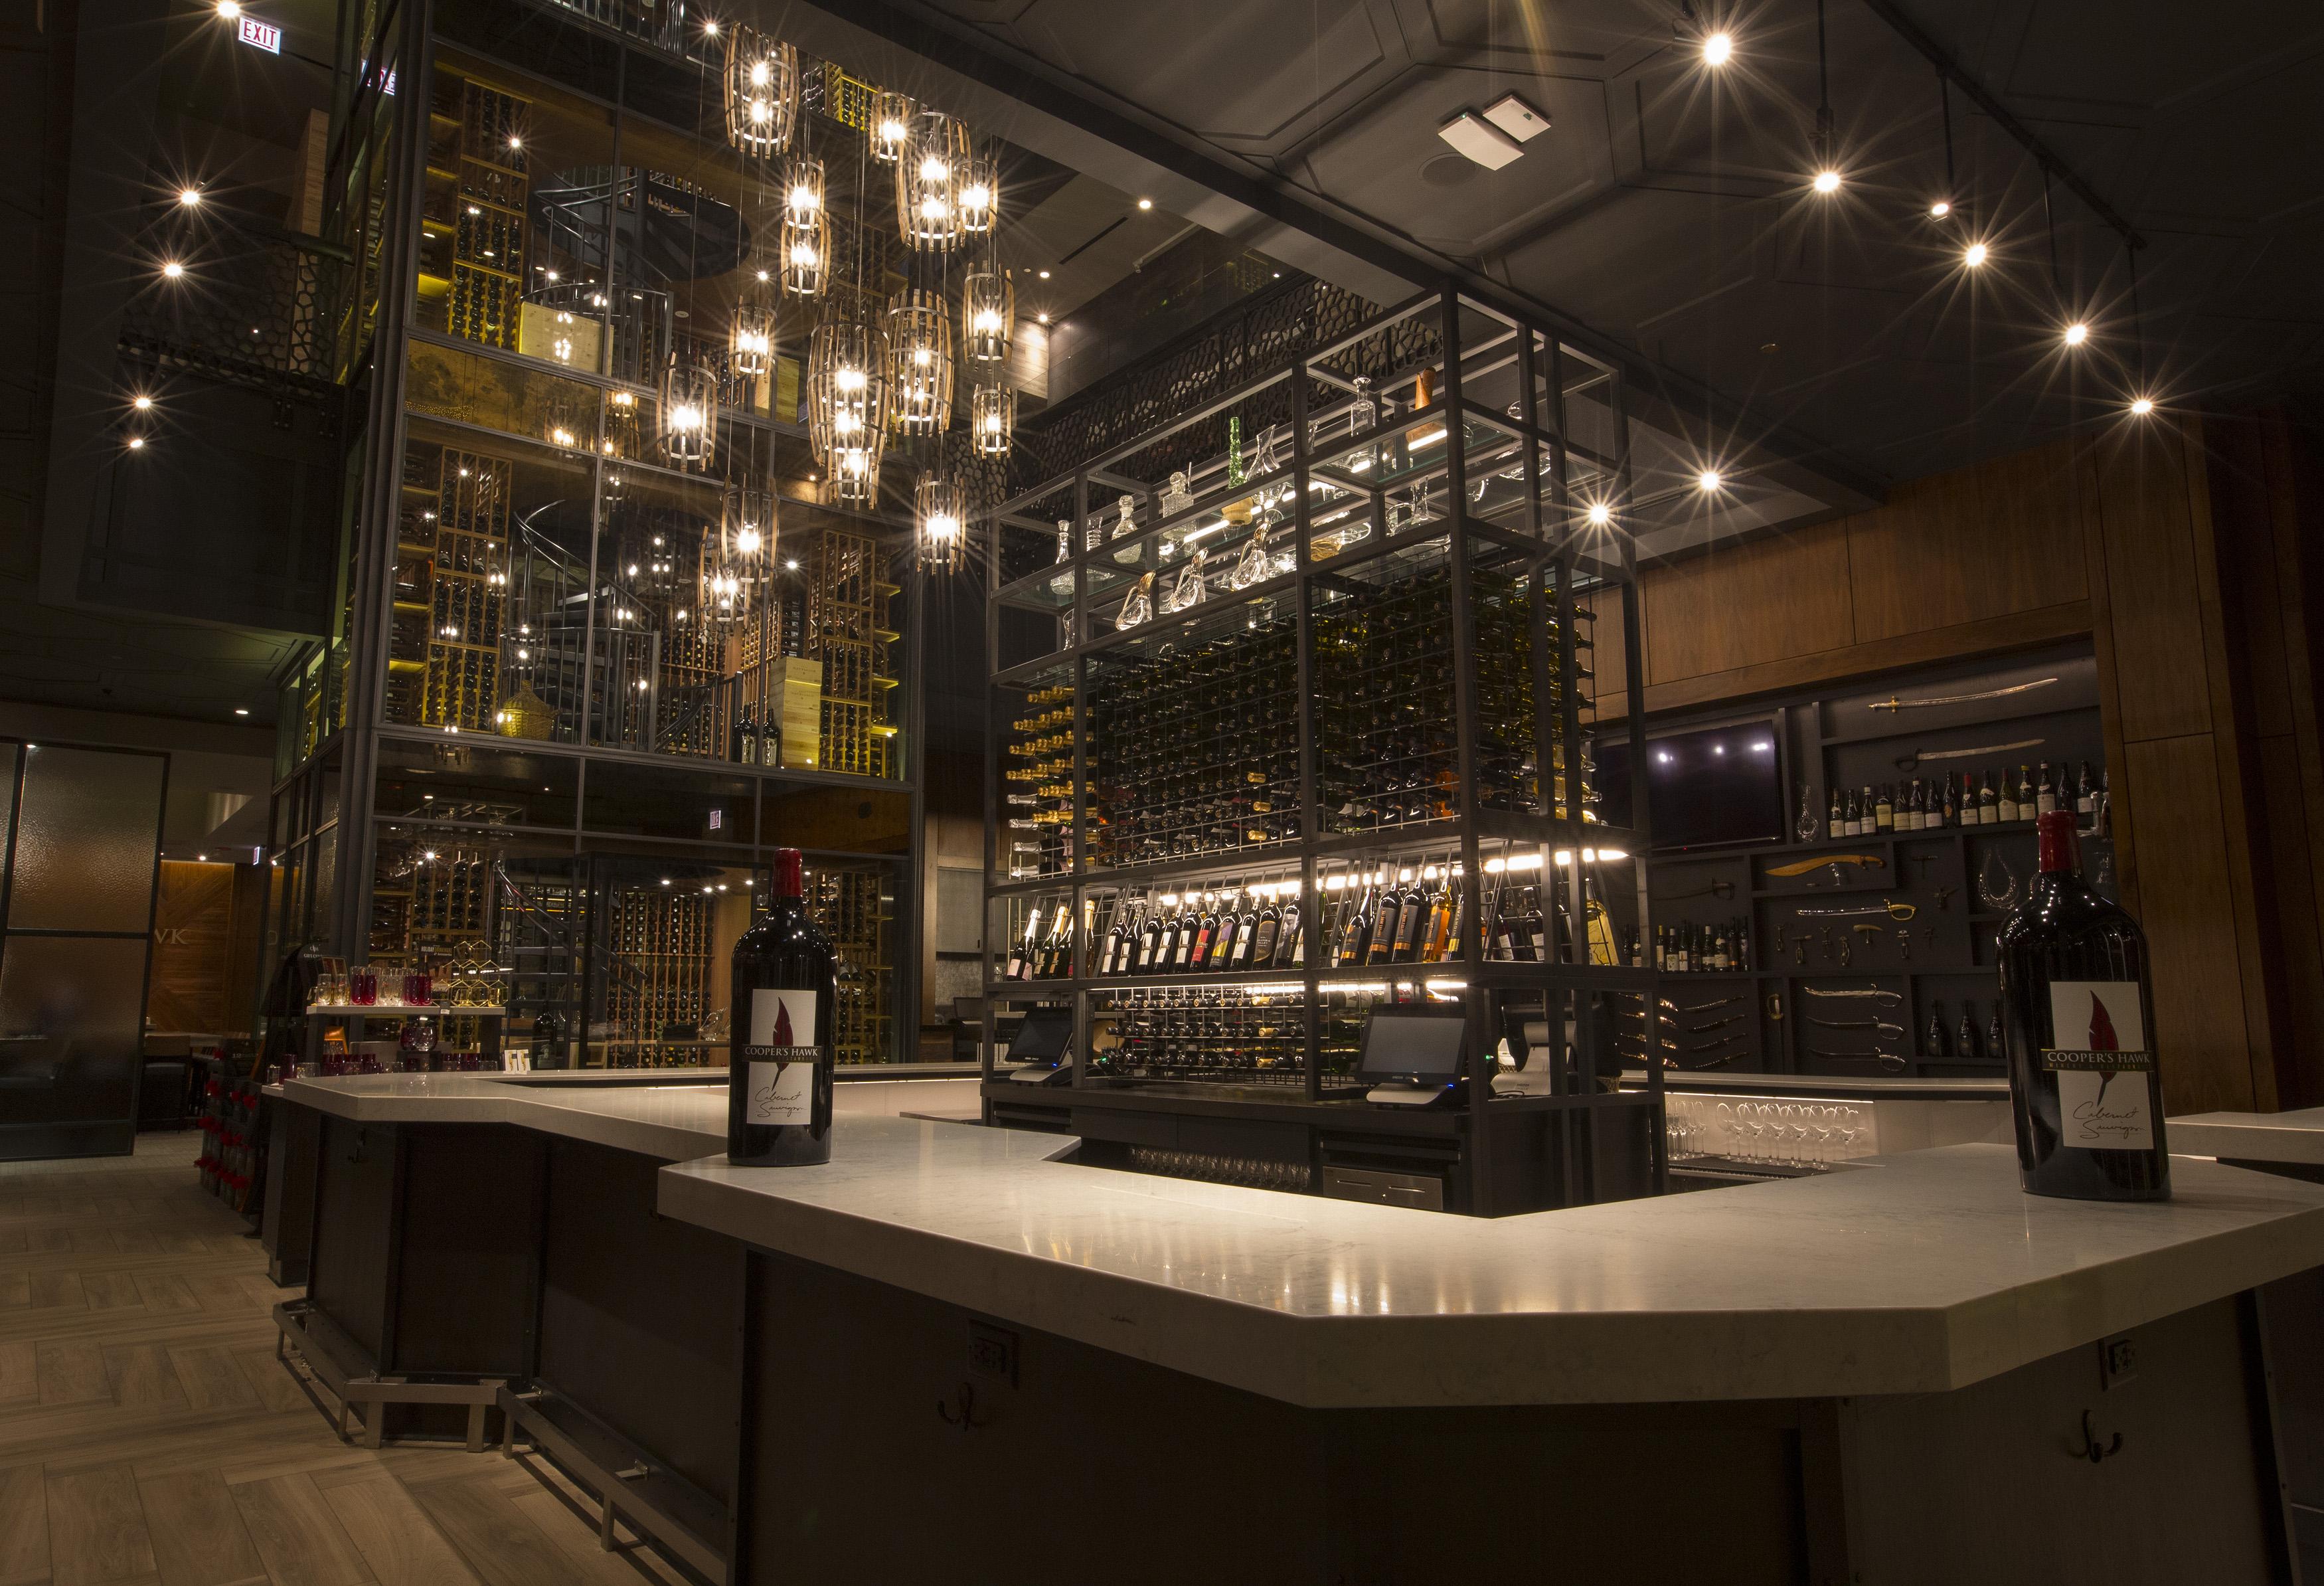 A three-floor wine tower inside a bar.